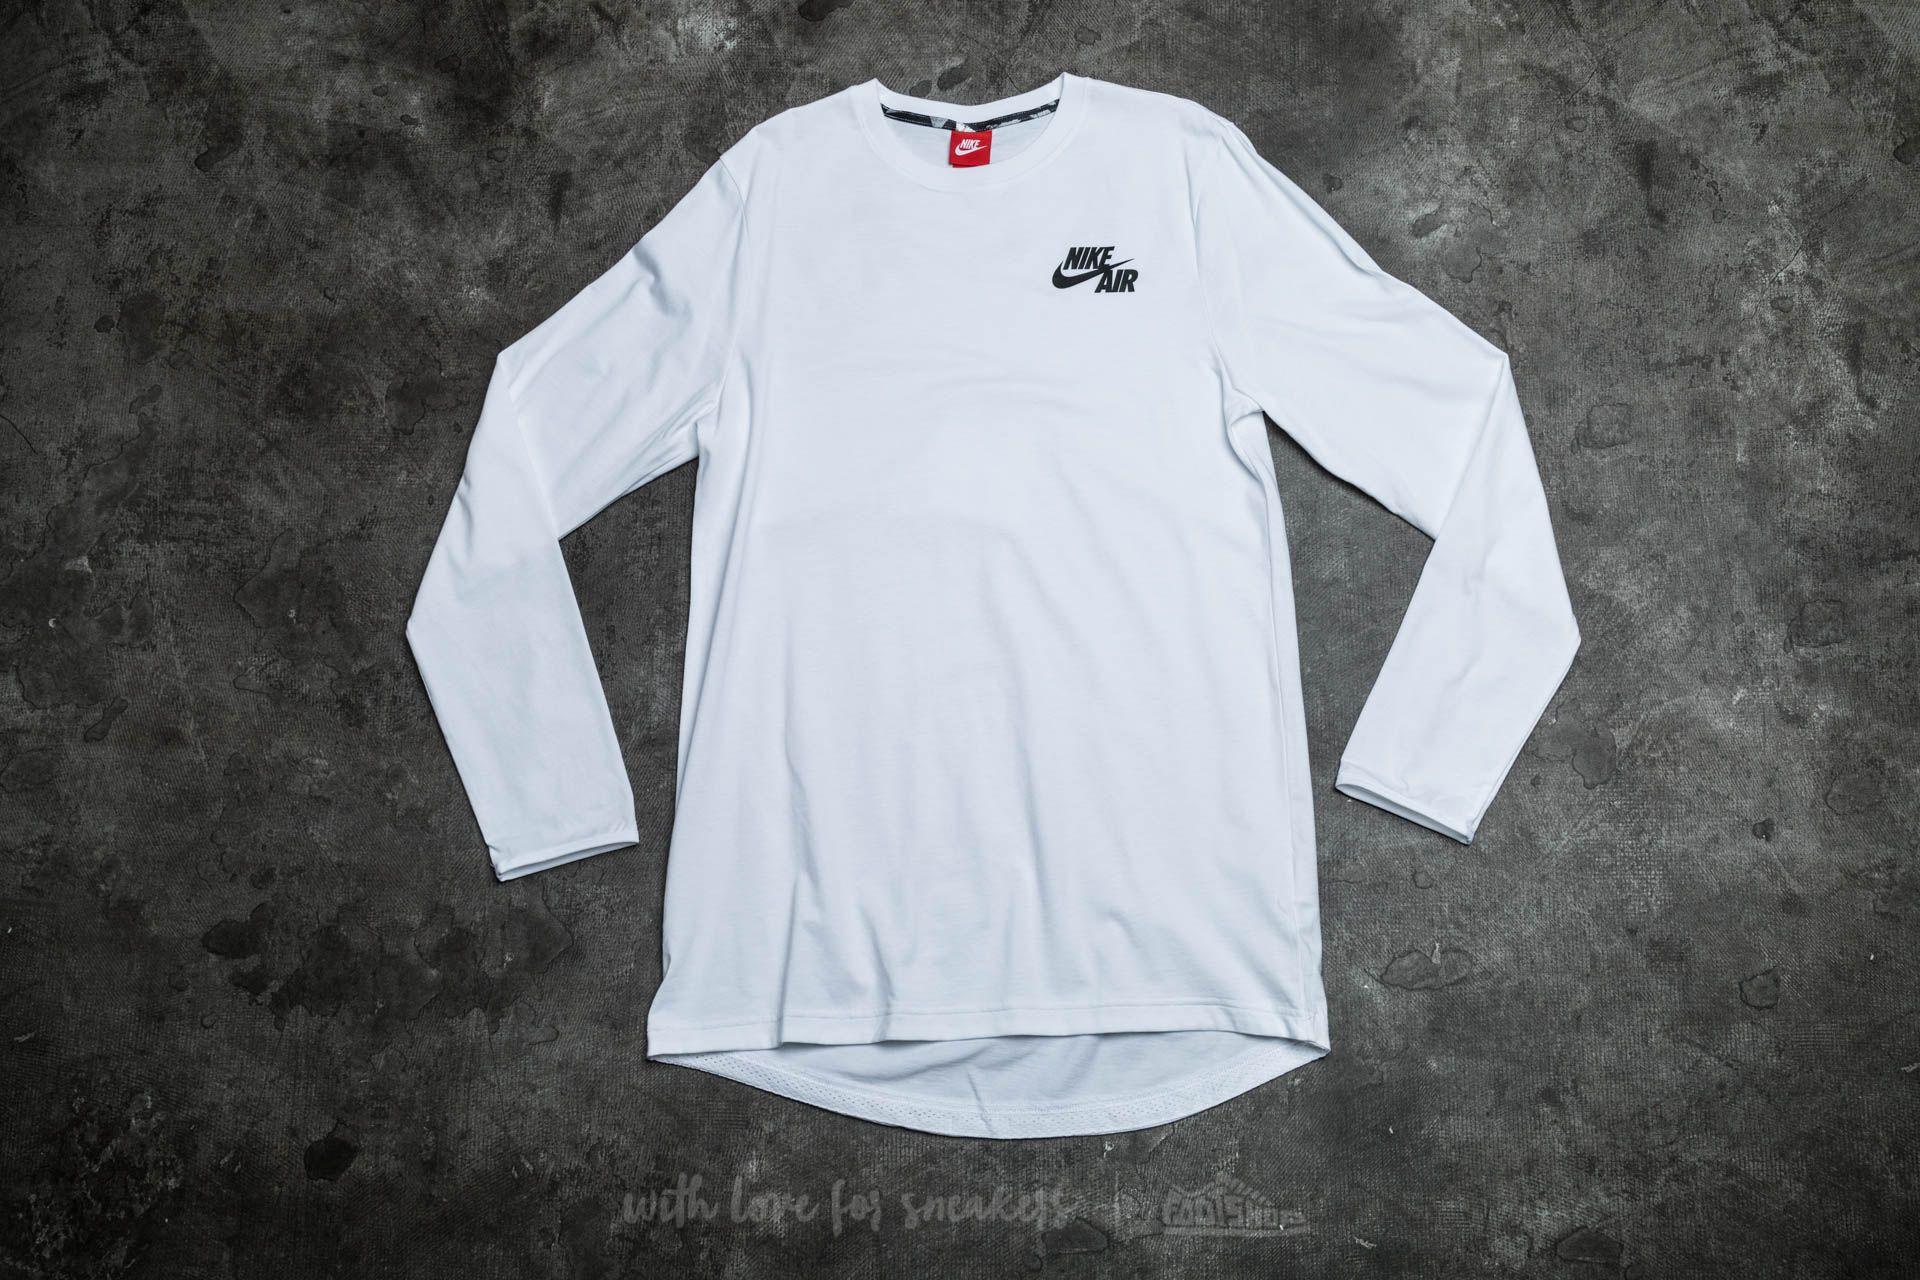 Nike Air Long Sleeve Top White/ Black